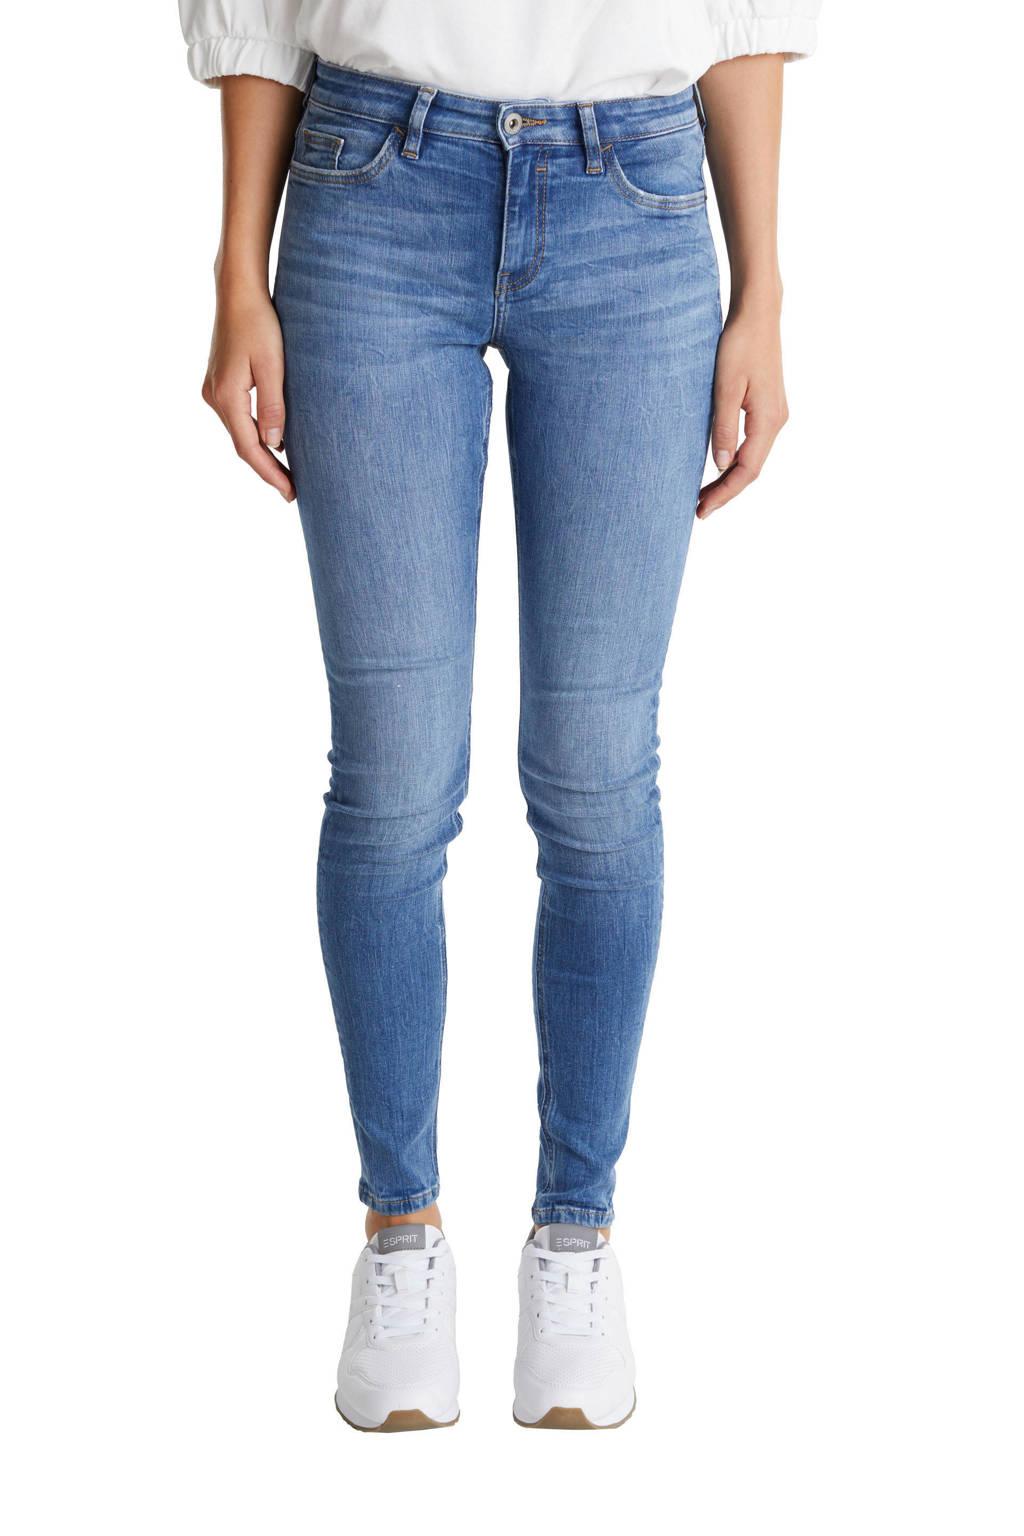 edc Women skinny jeans light denim stonewashed, Light denim stonewashed